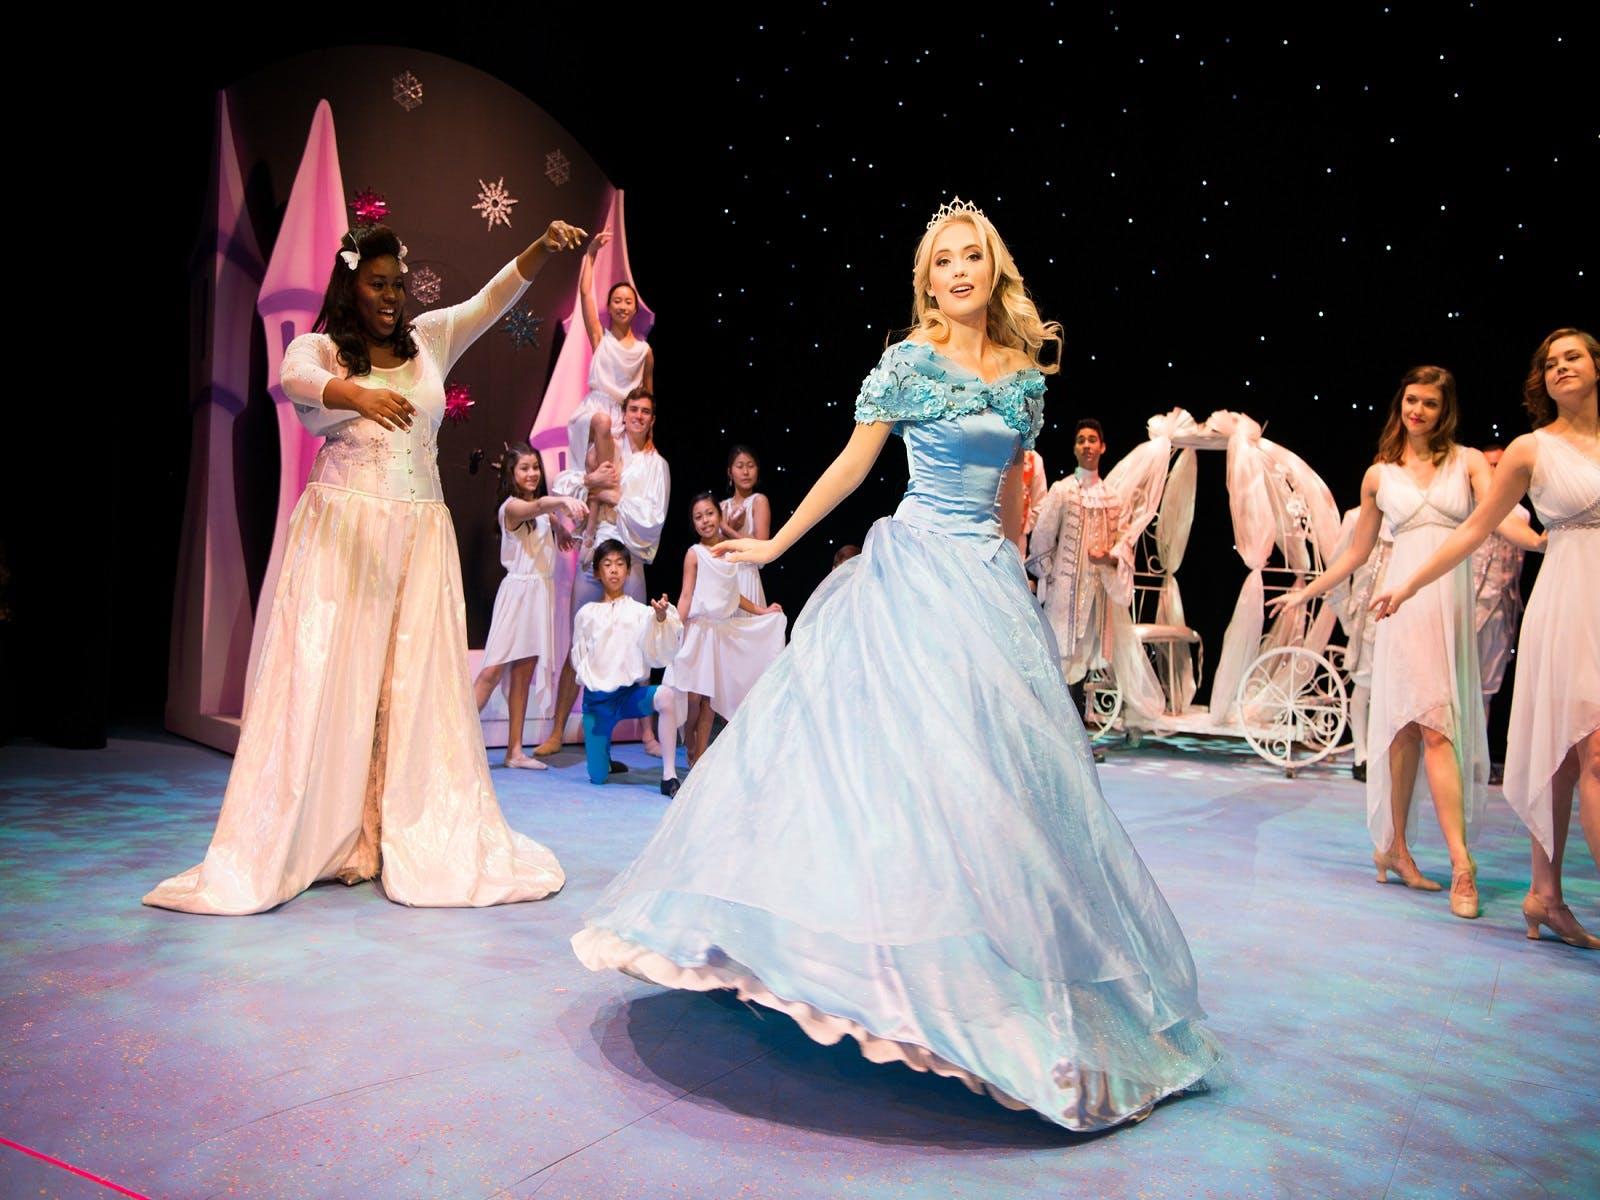 A Cinderella Christmas.A Cinderella Christmas Tickets Los Angeles Oc Todaytix